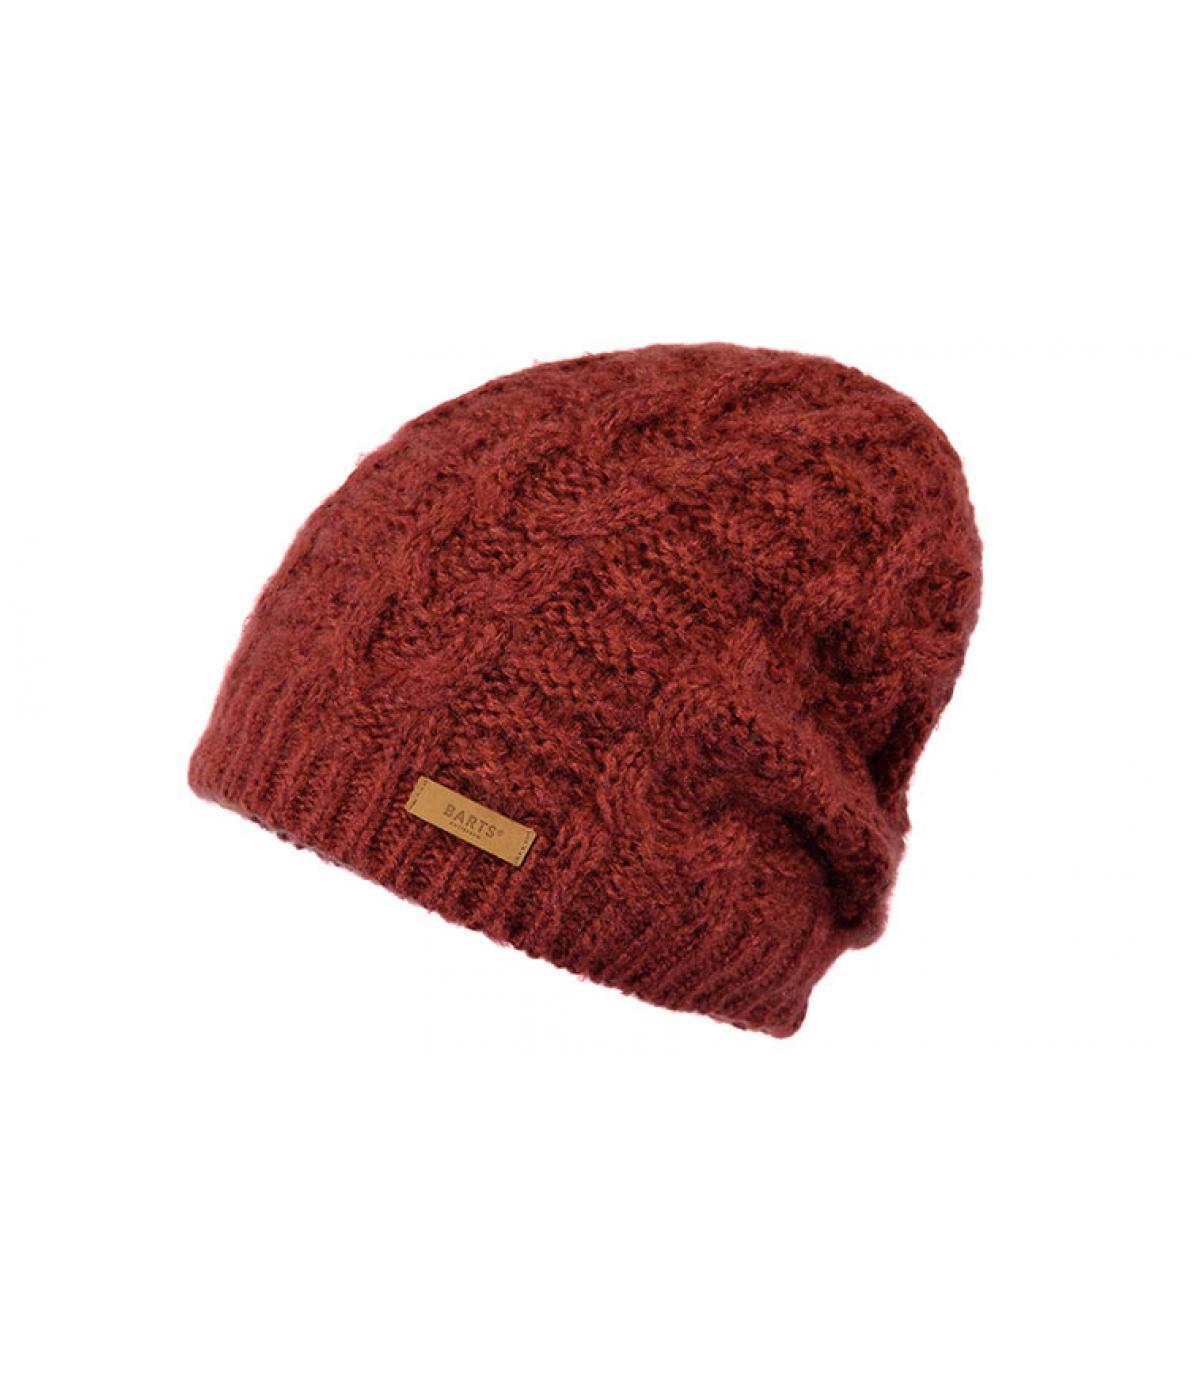 Mütze bordeaux Zopfmuster